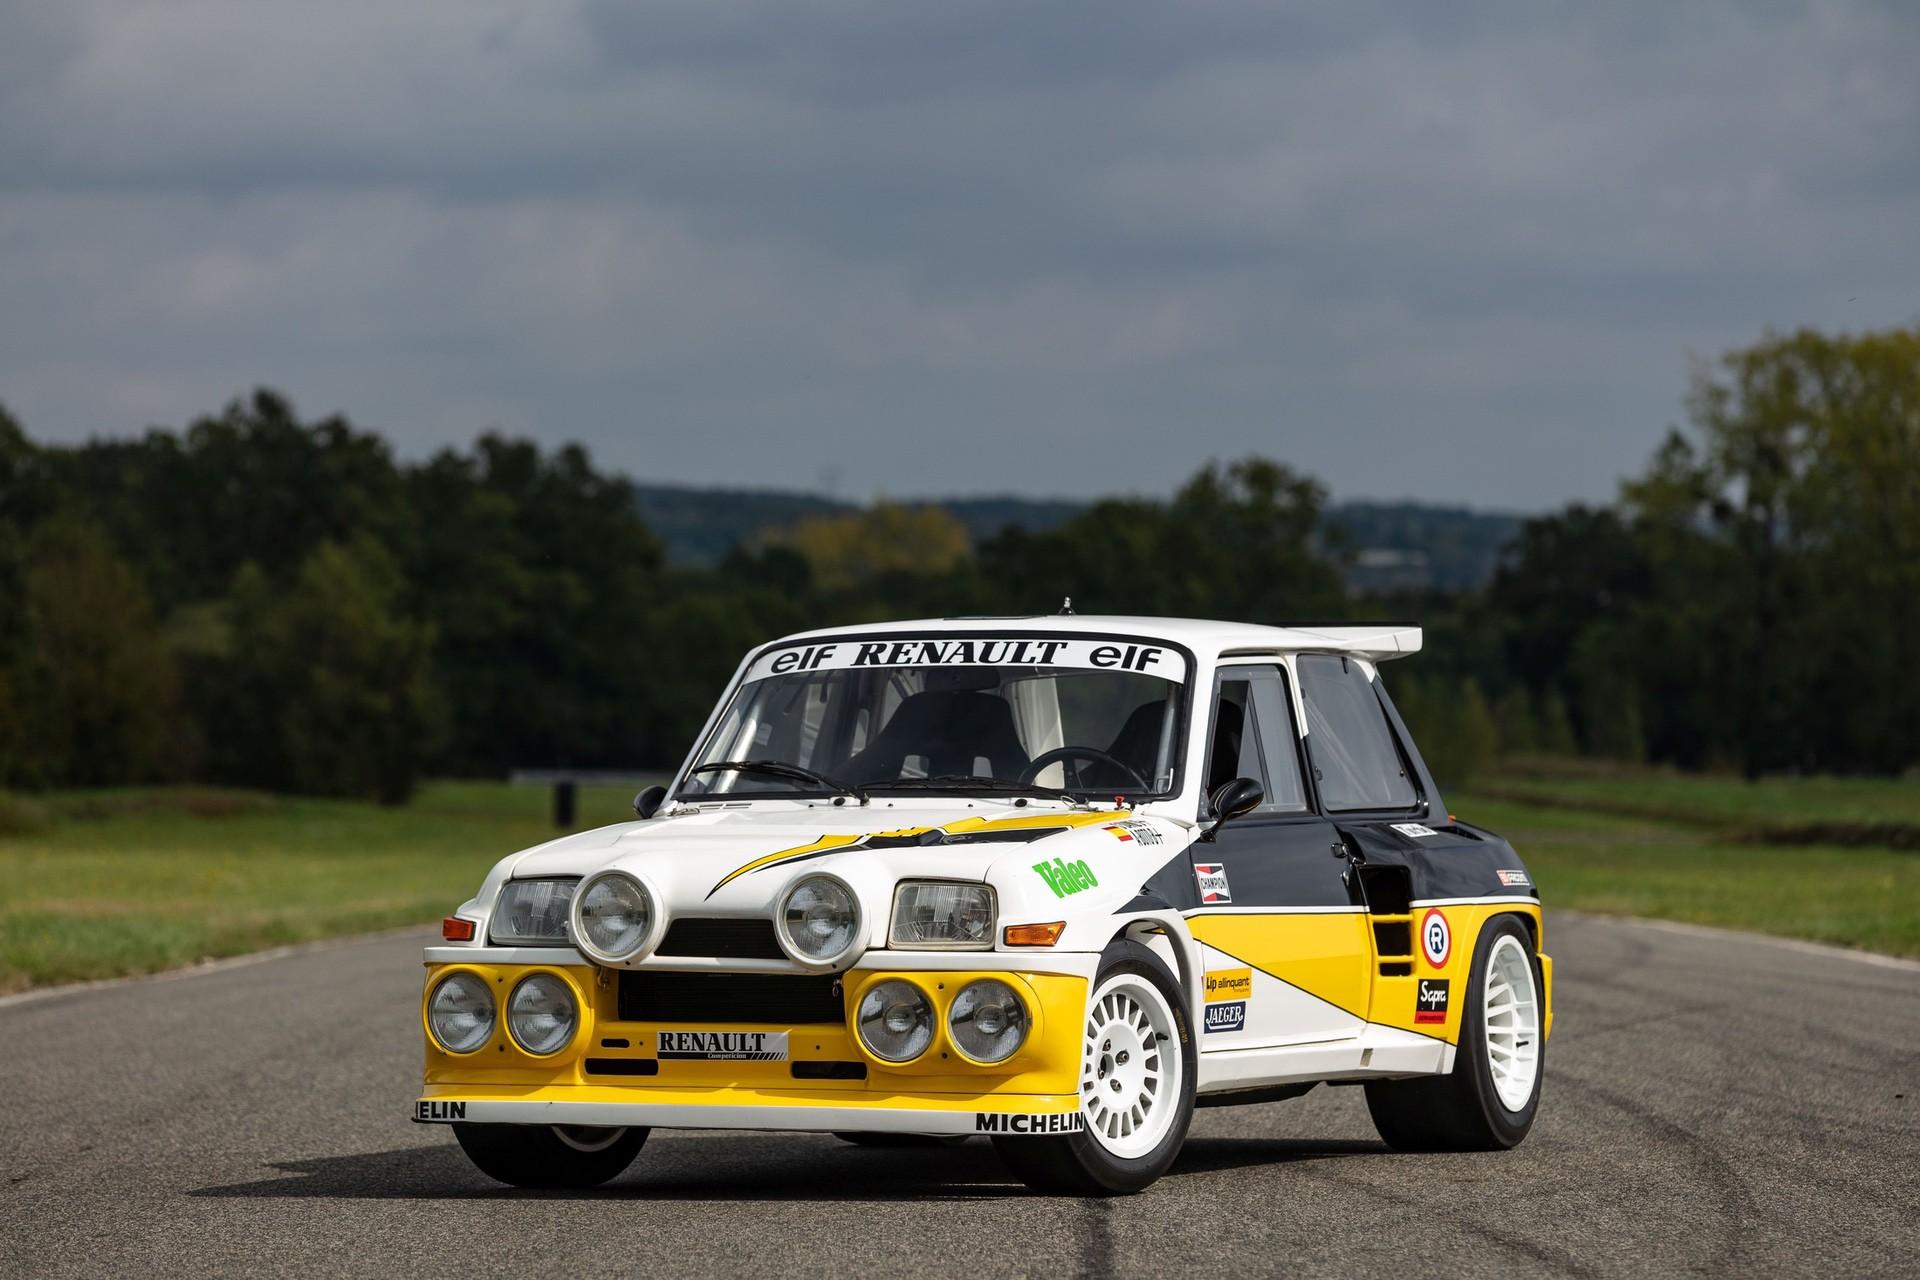 Renault_R5_Maxi_Turbo_ex-Carlos_Sainz-0002